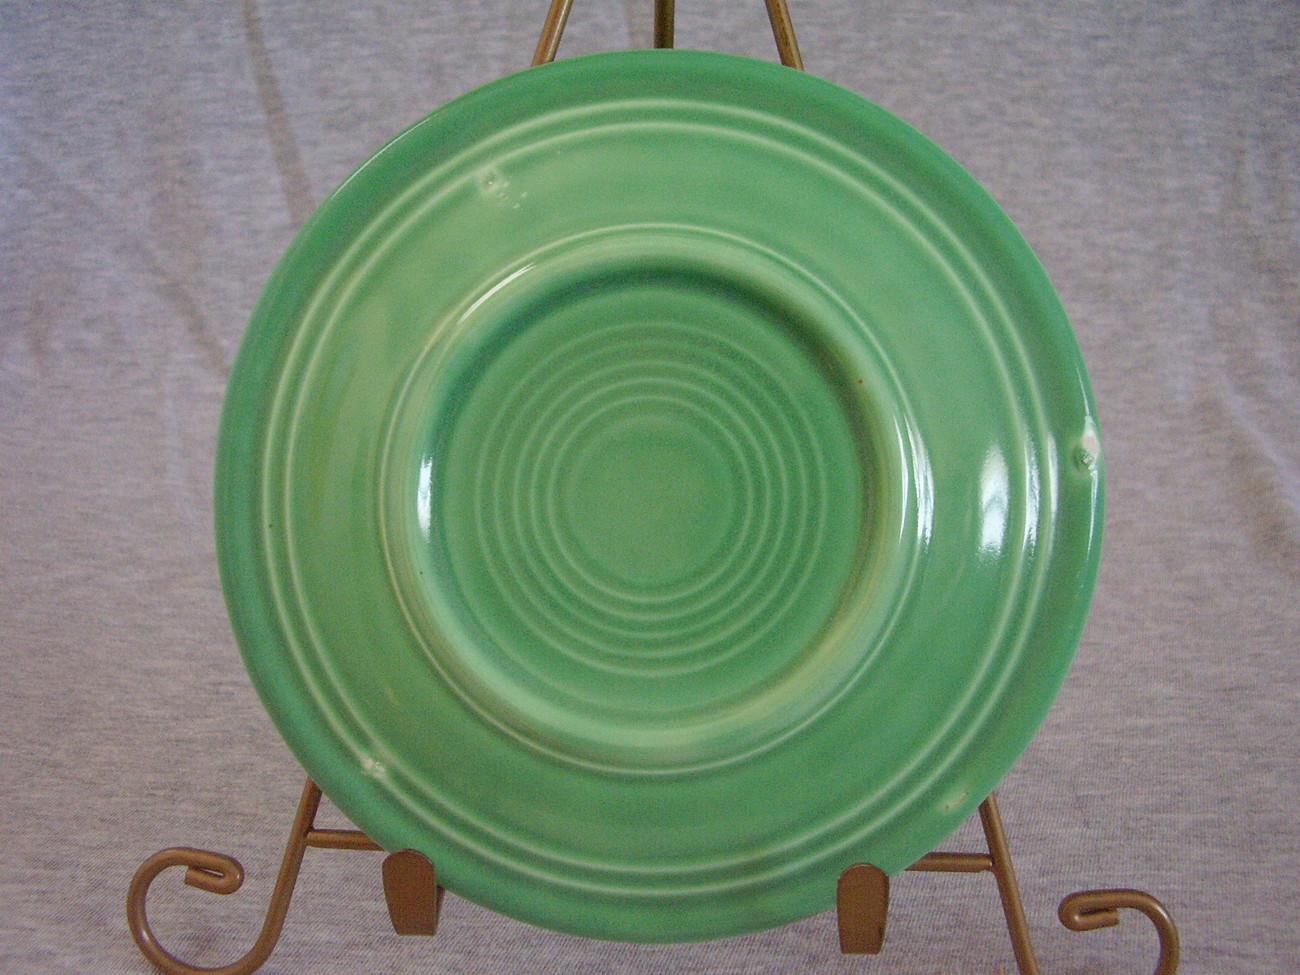 Vintage Fiestaware Original Green Bread Butter Plate  F